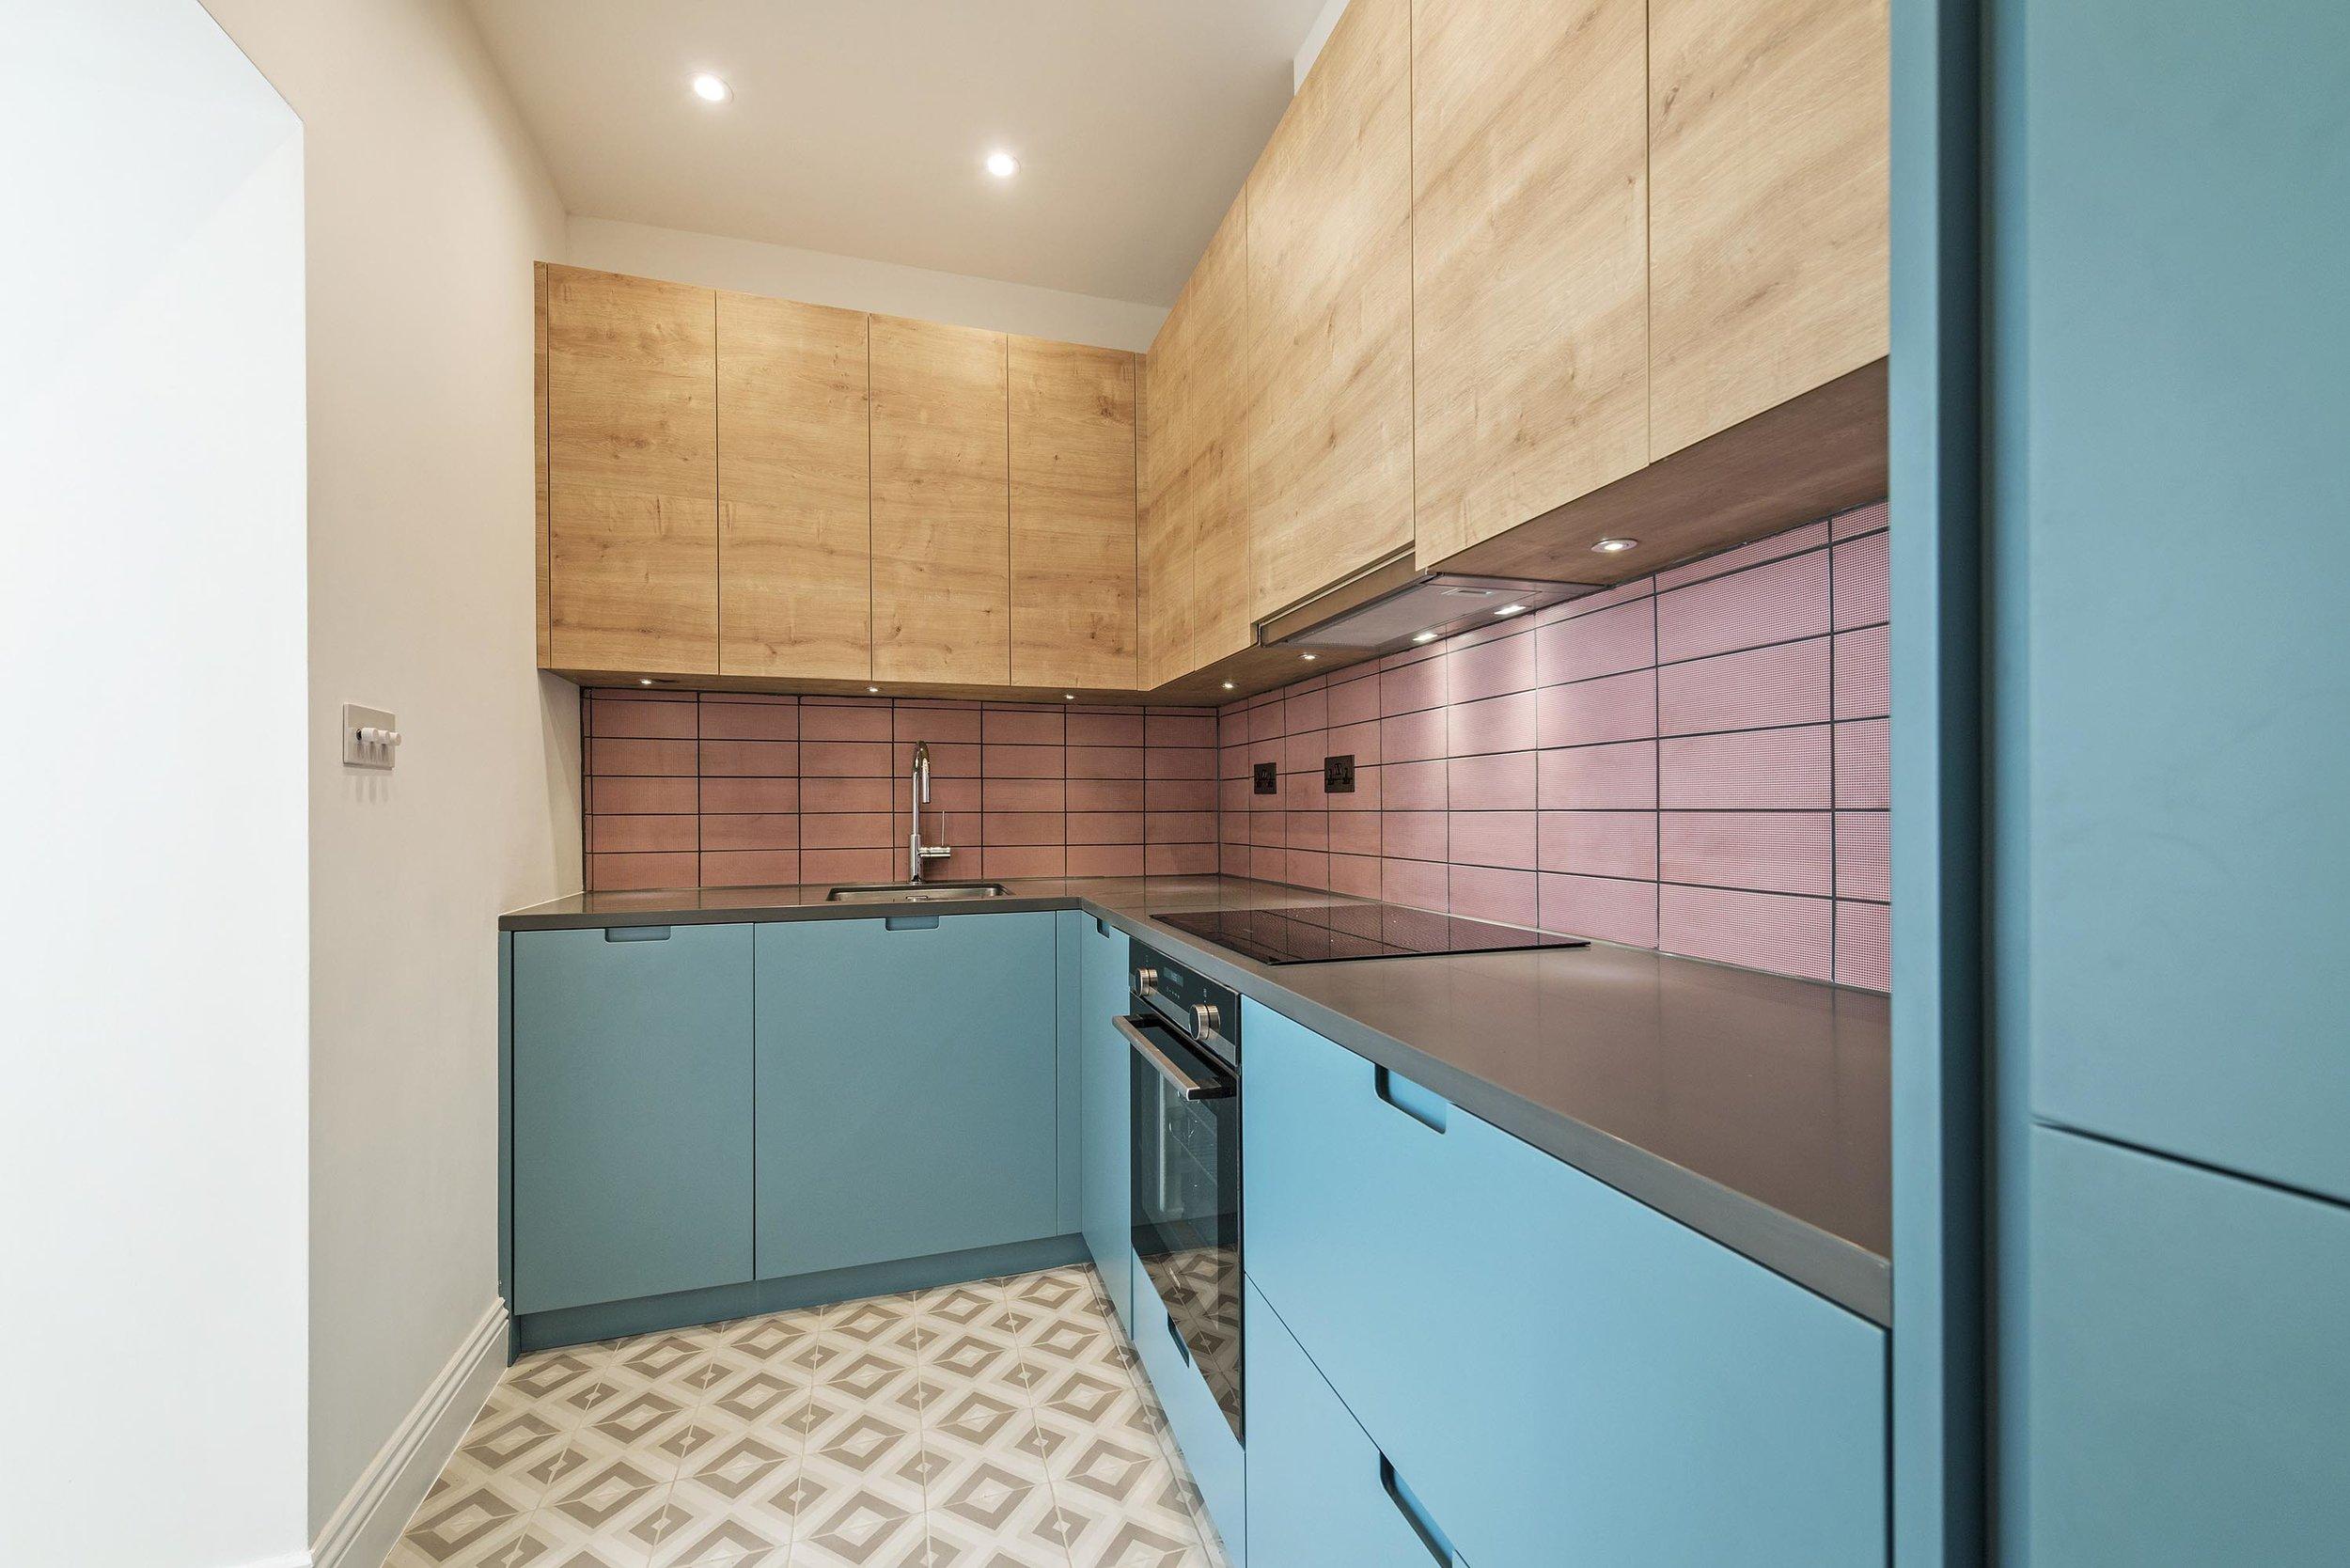 west-london-interior-design-company